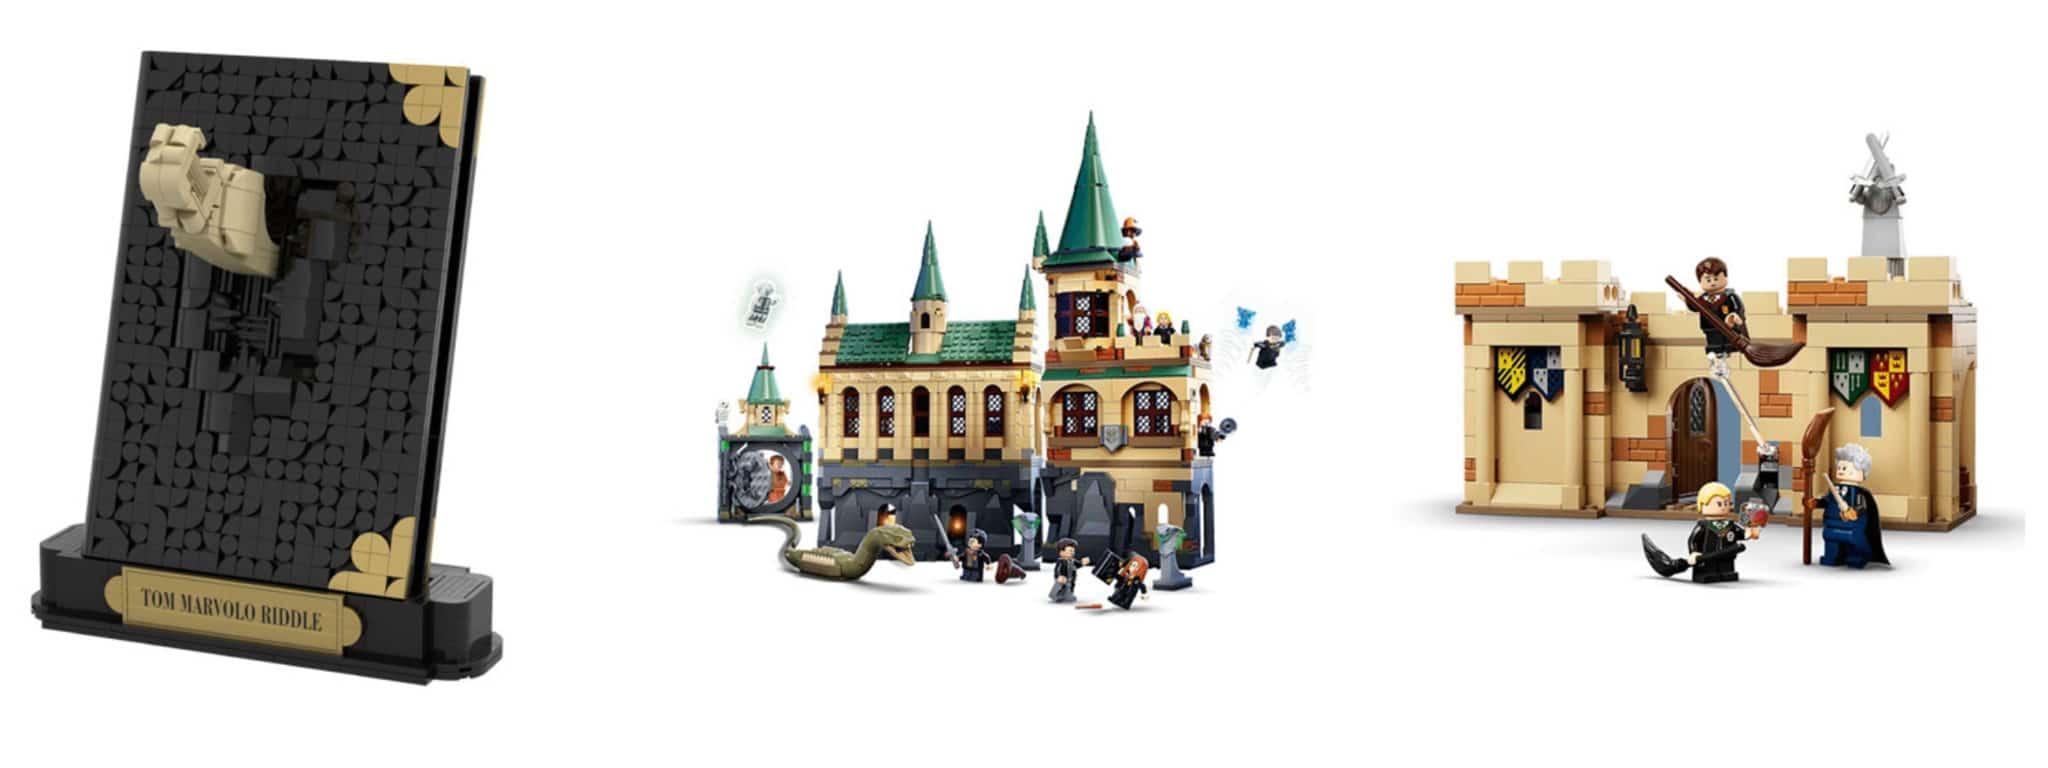 LEGO Harry Potter Bauwettbewerb Preise